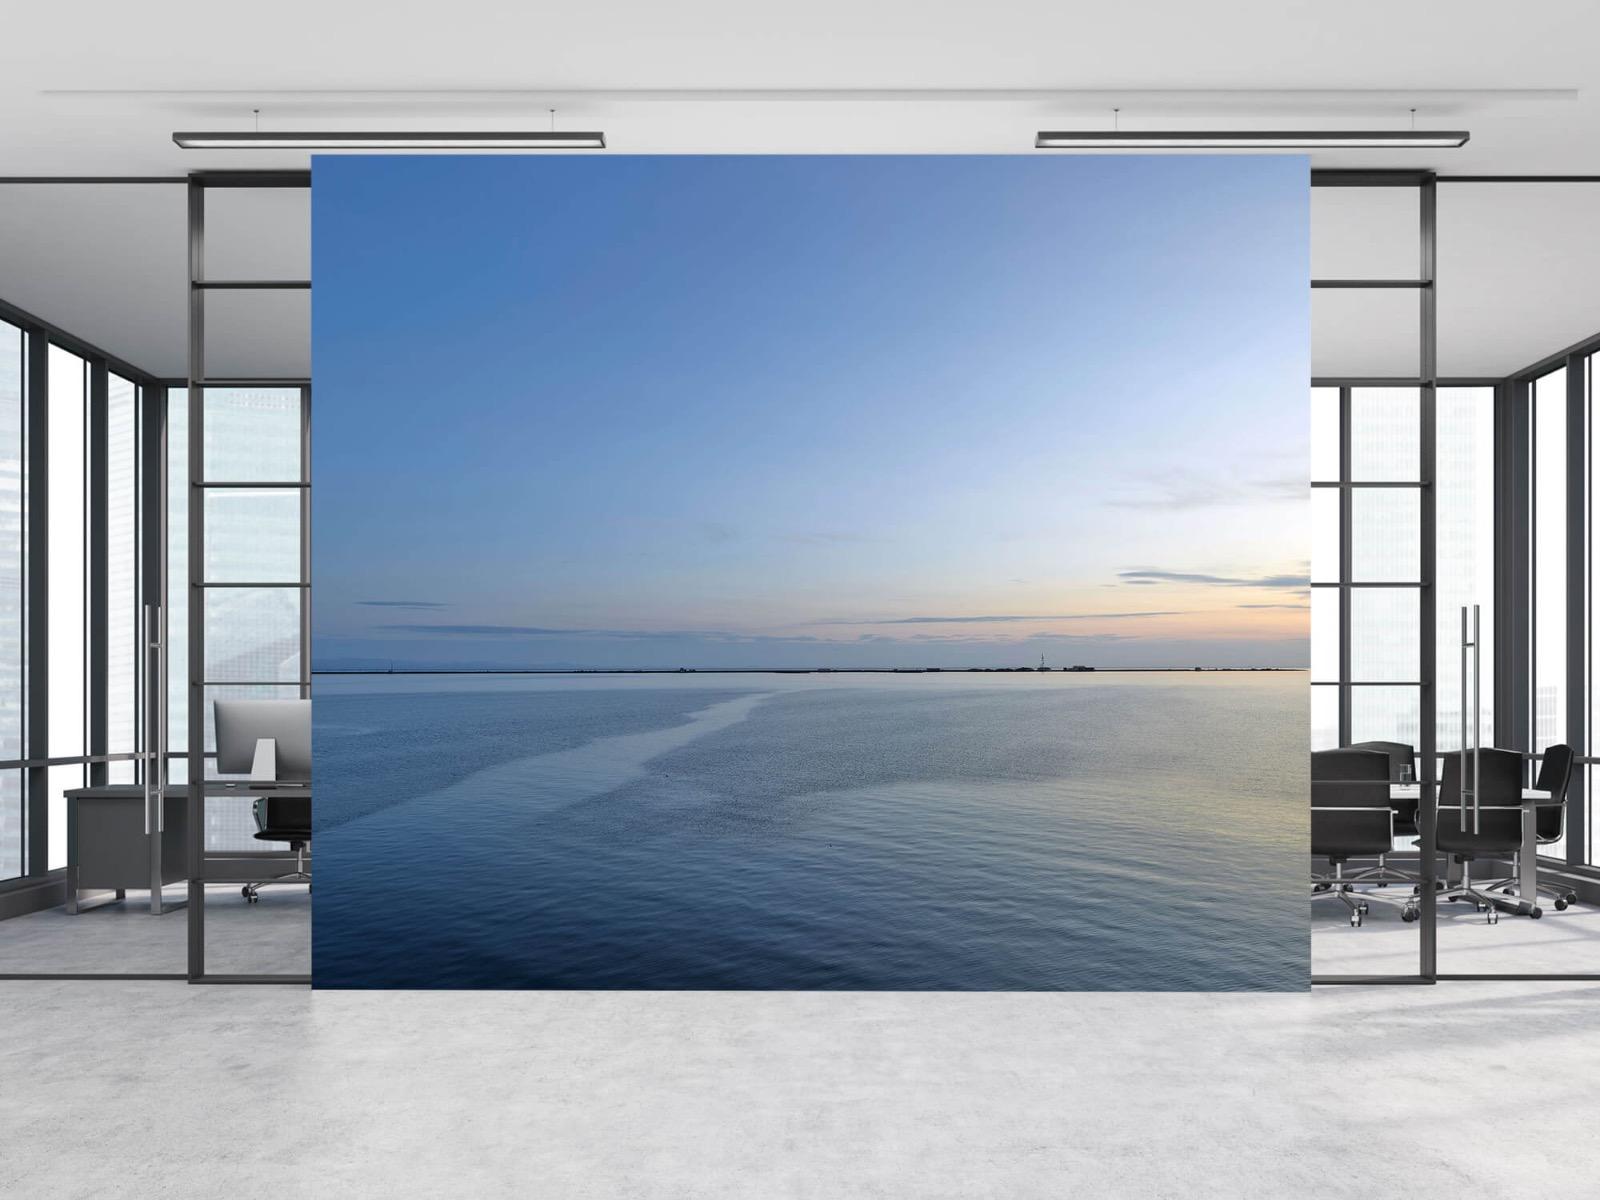 Zeeën en Oceanen - Zee en zonsopkomst - Wallexclusive - Woonkamer 9